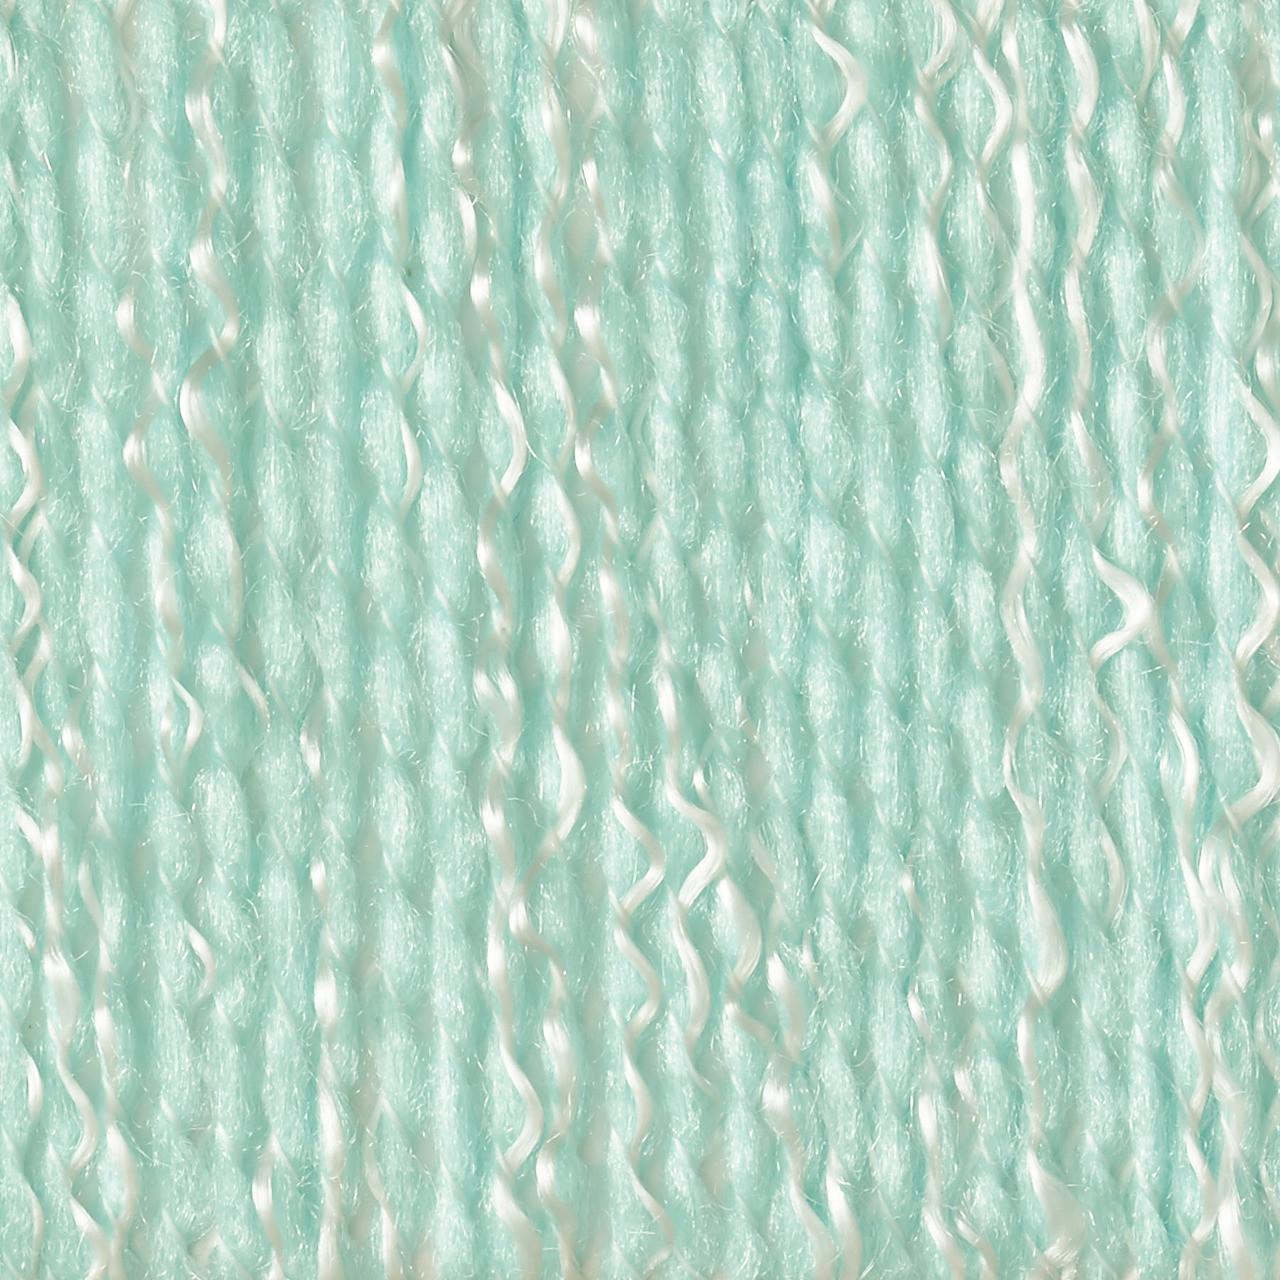 ae1e0897a85d Bernat Soft Turquoise Baby Coordinates Yarn (3 - Light)